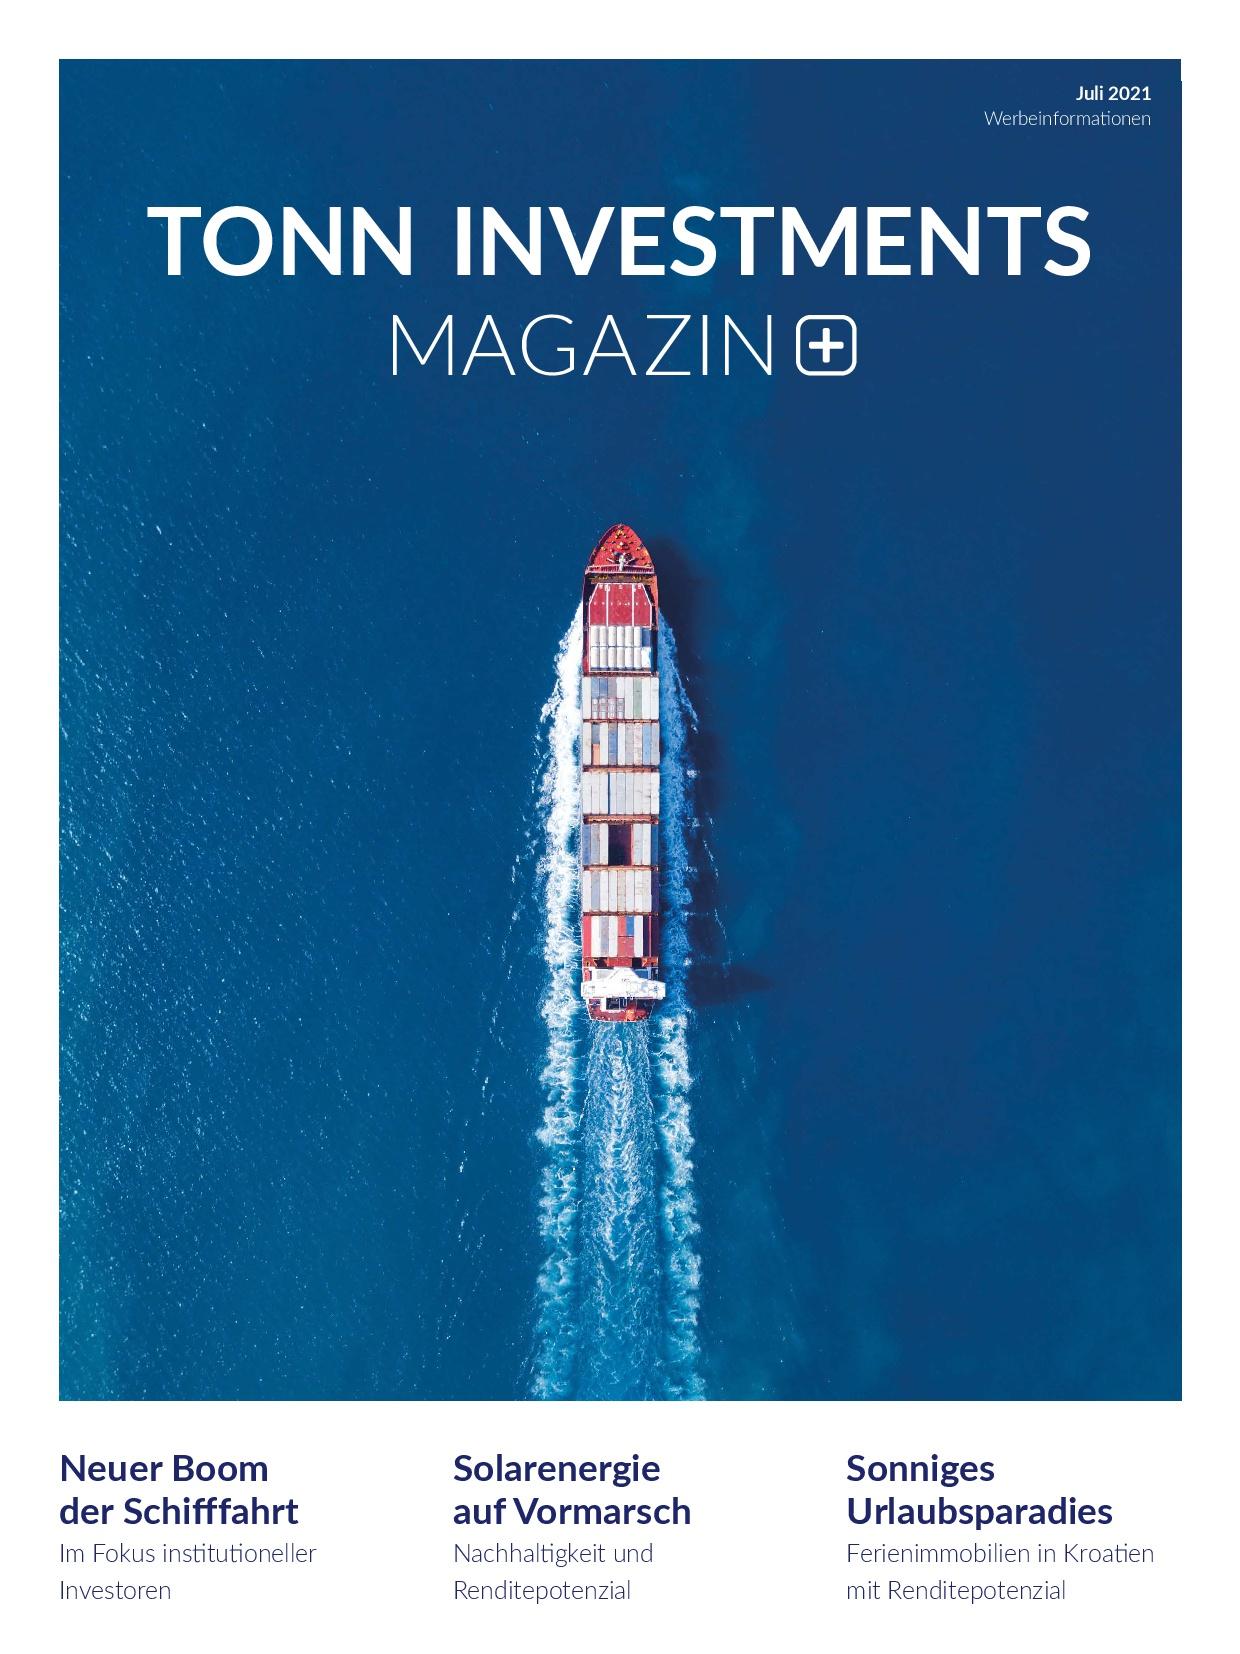 Tonn Investment Magazin